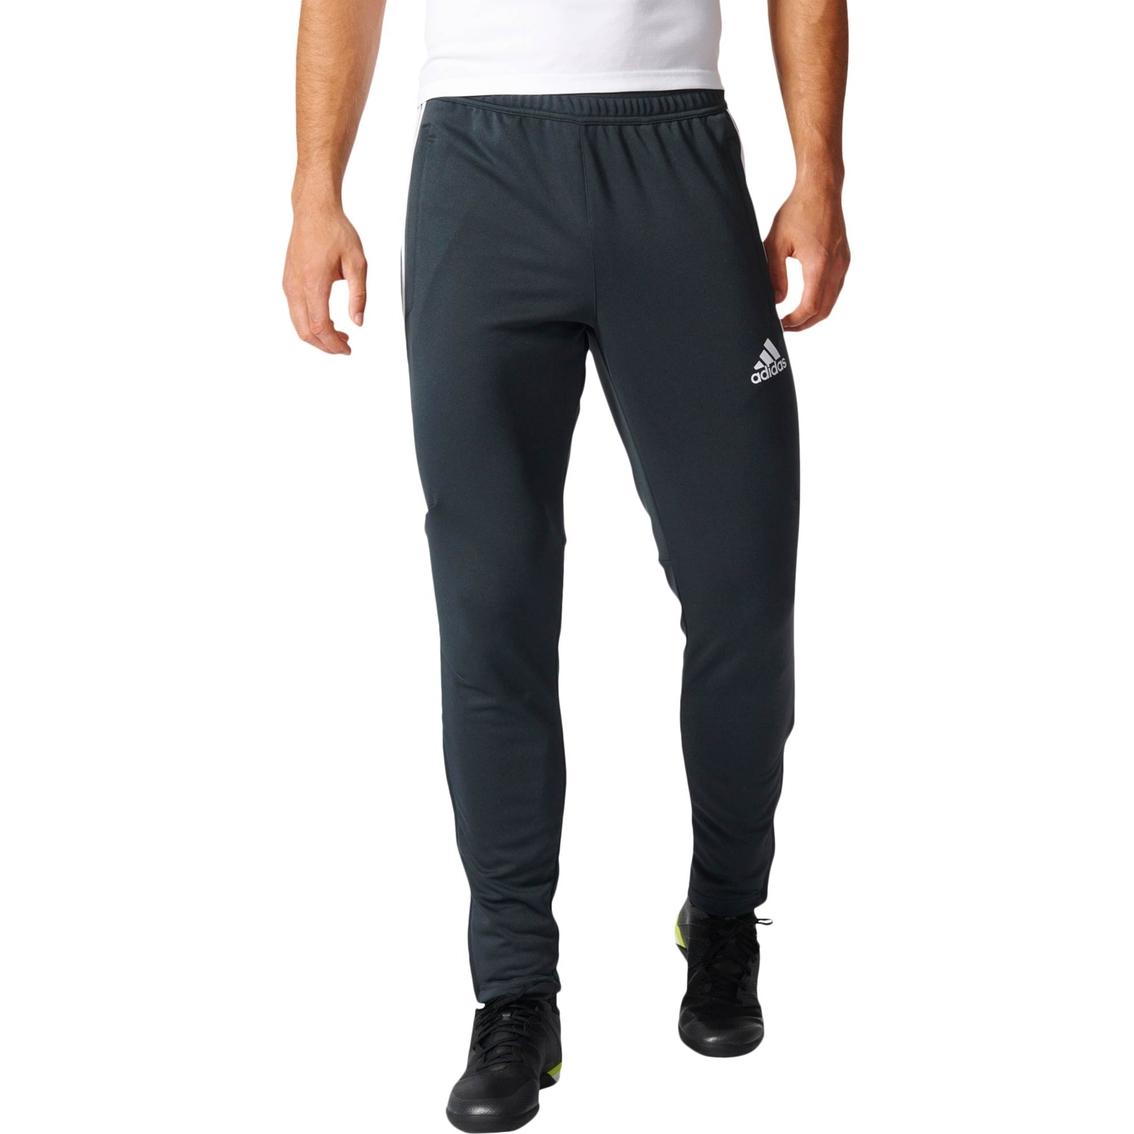 cc0a6f47f033 Adidas Tiro 17 Training Pants